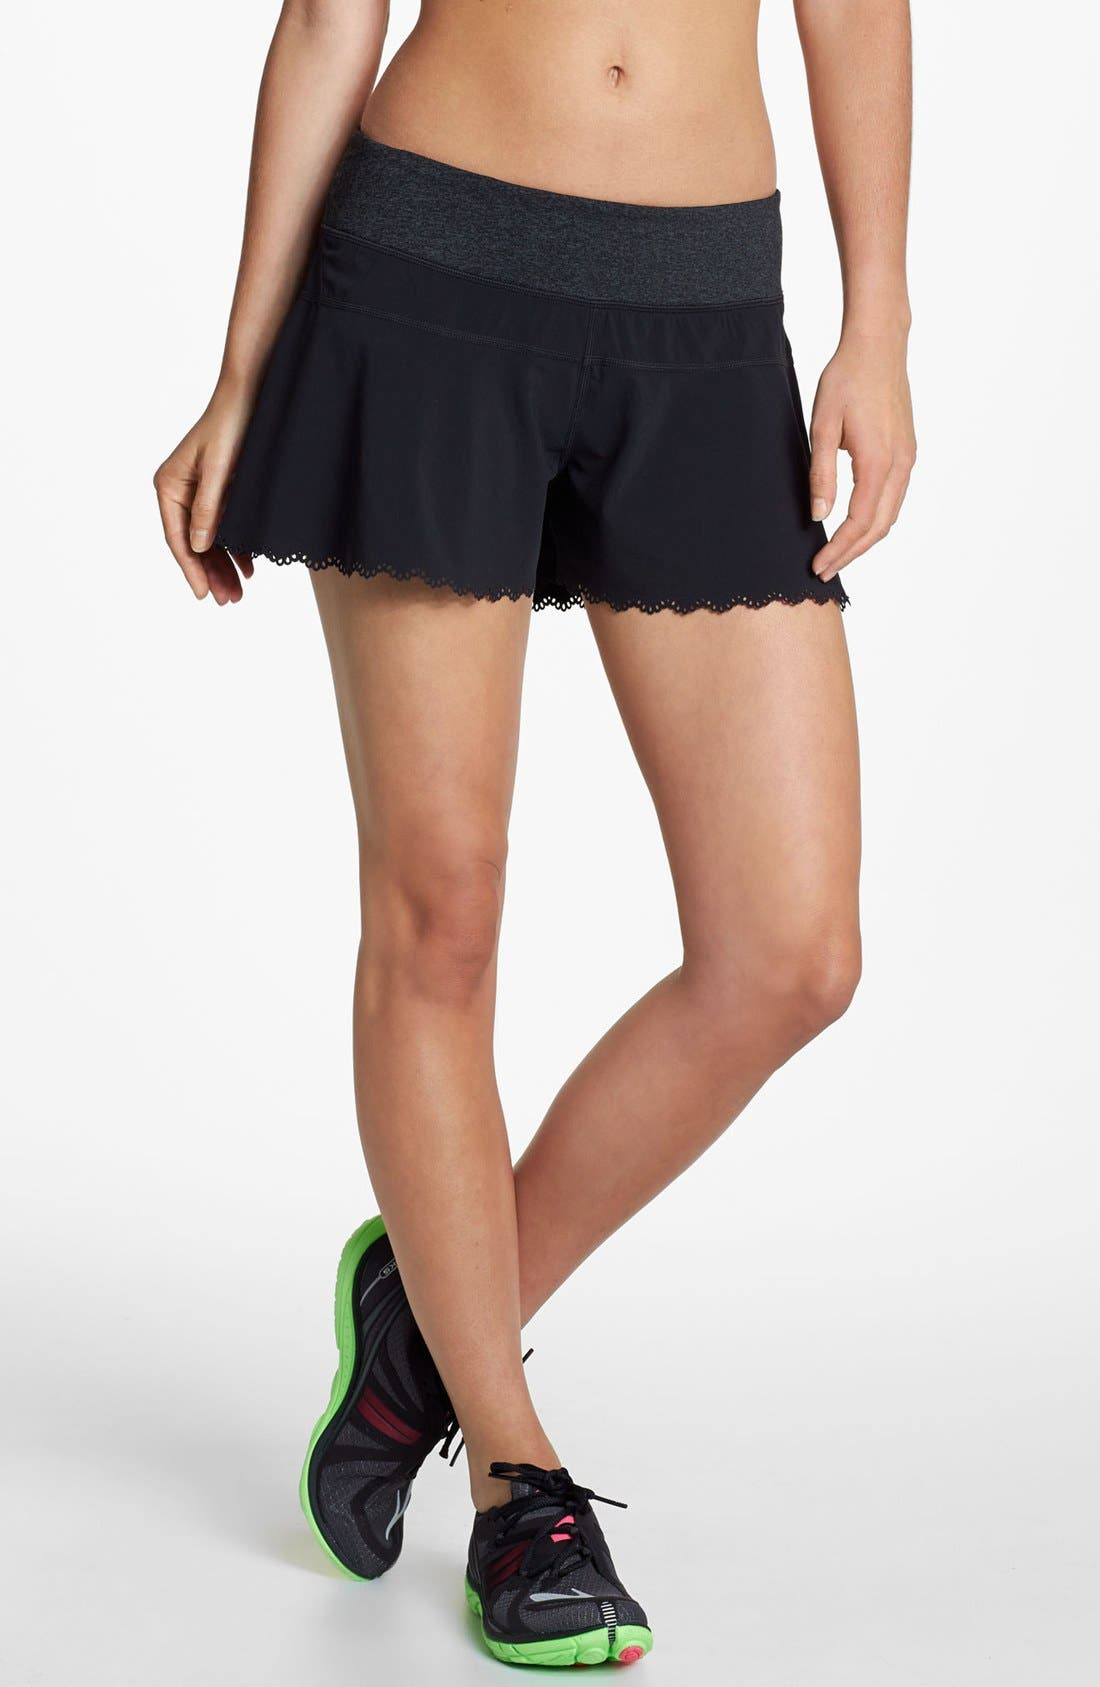 Alternate Image 1 Selected - Zella 'Hero' Shorts (Online Only)